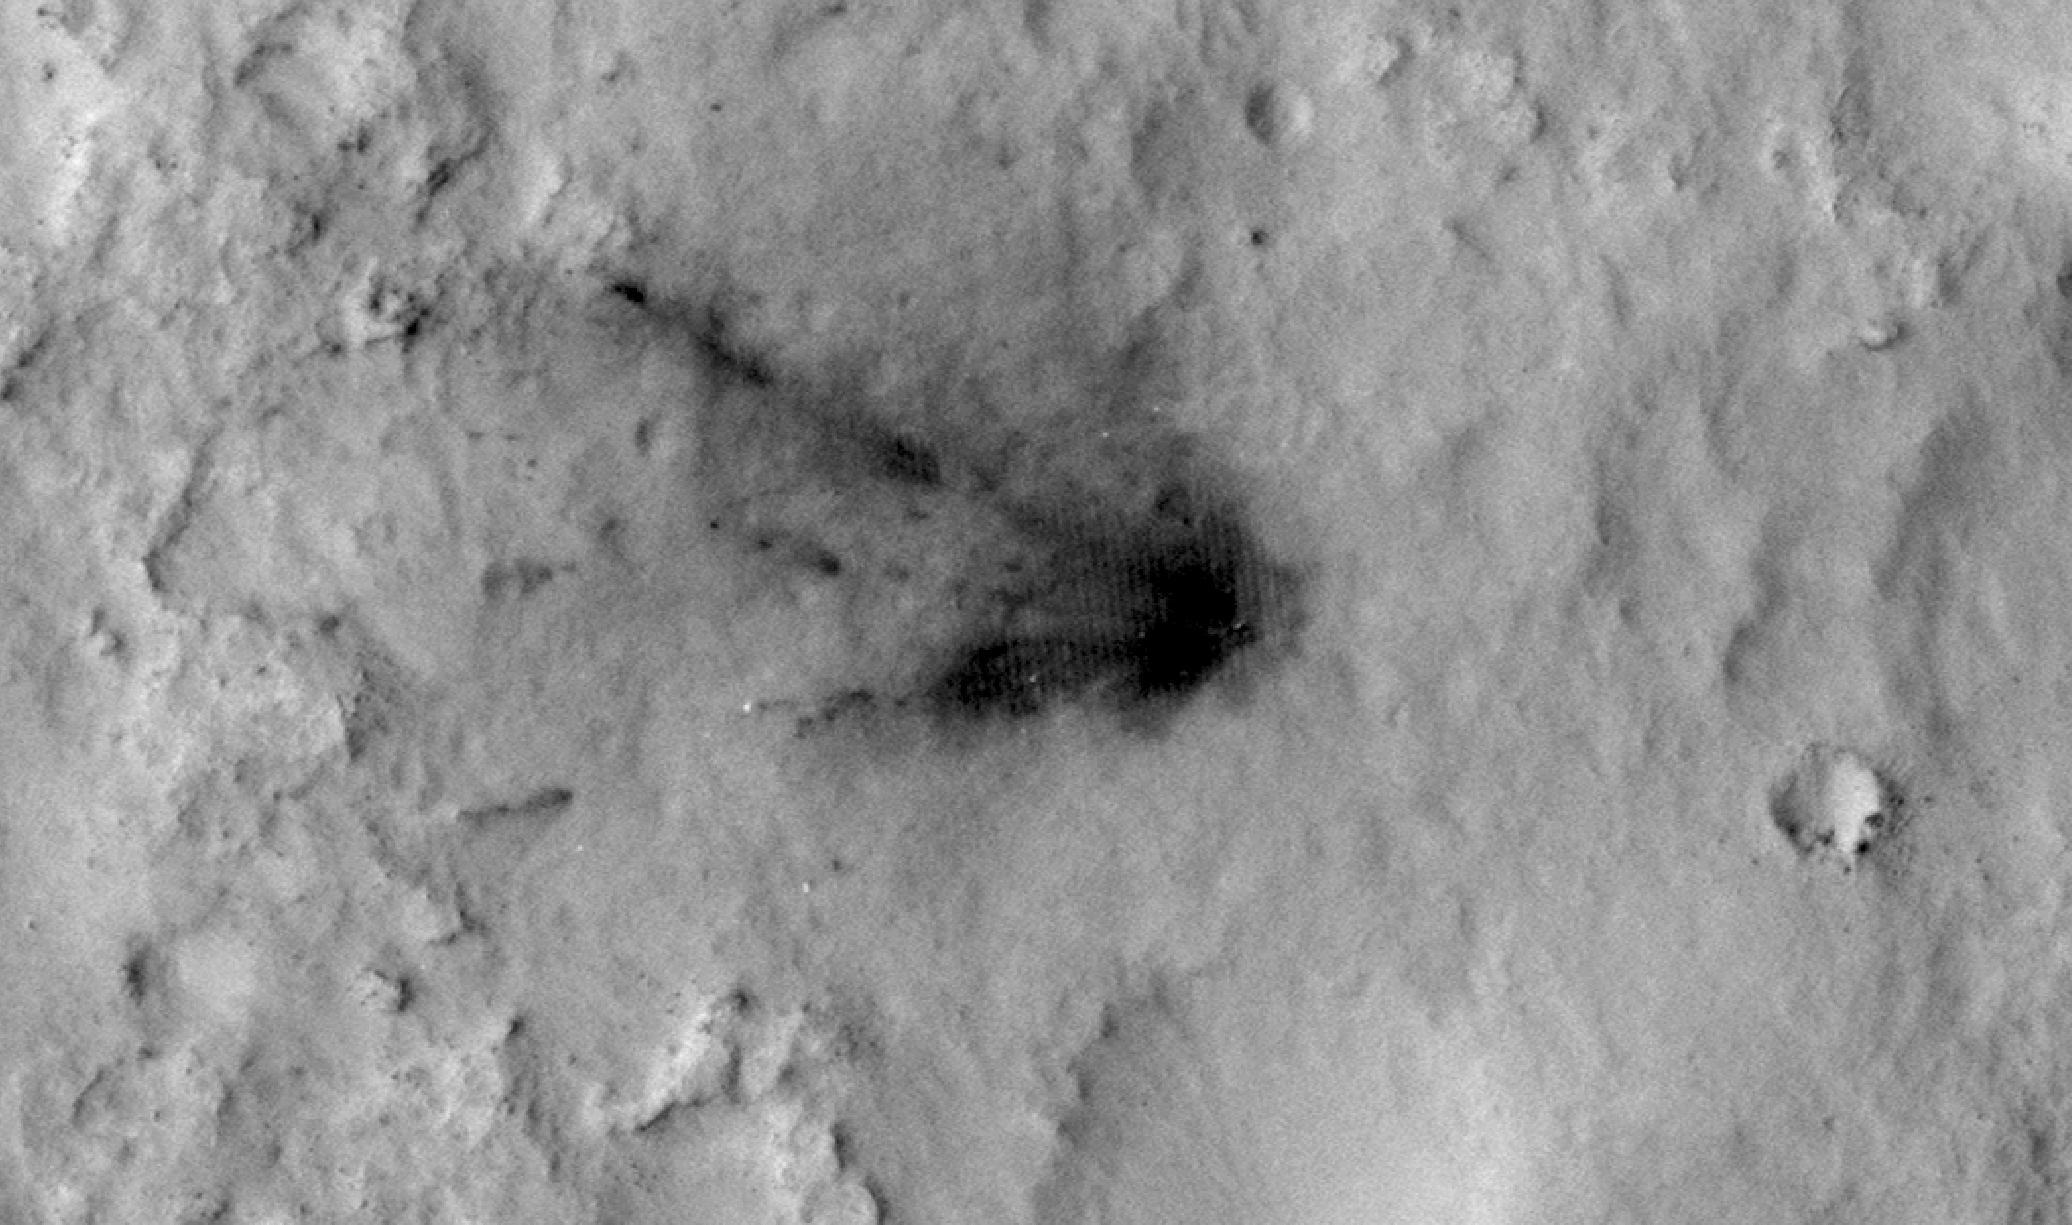 Blast Zone Created by Curiosity Rover's Sky Crane